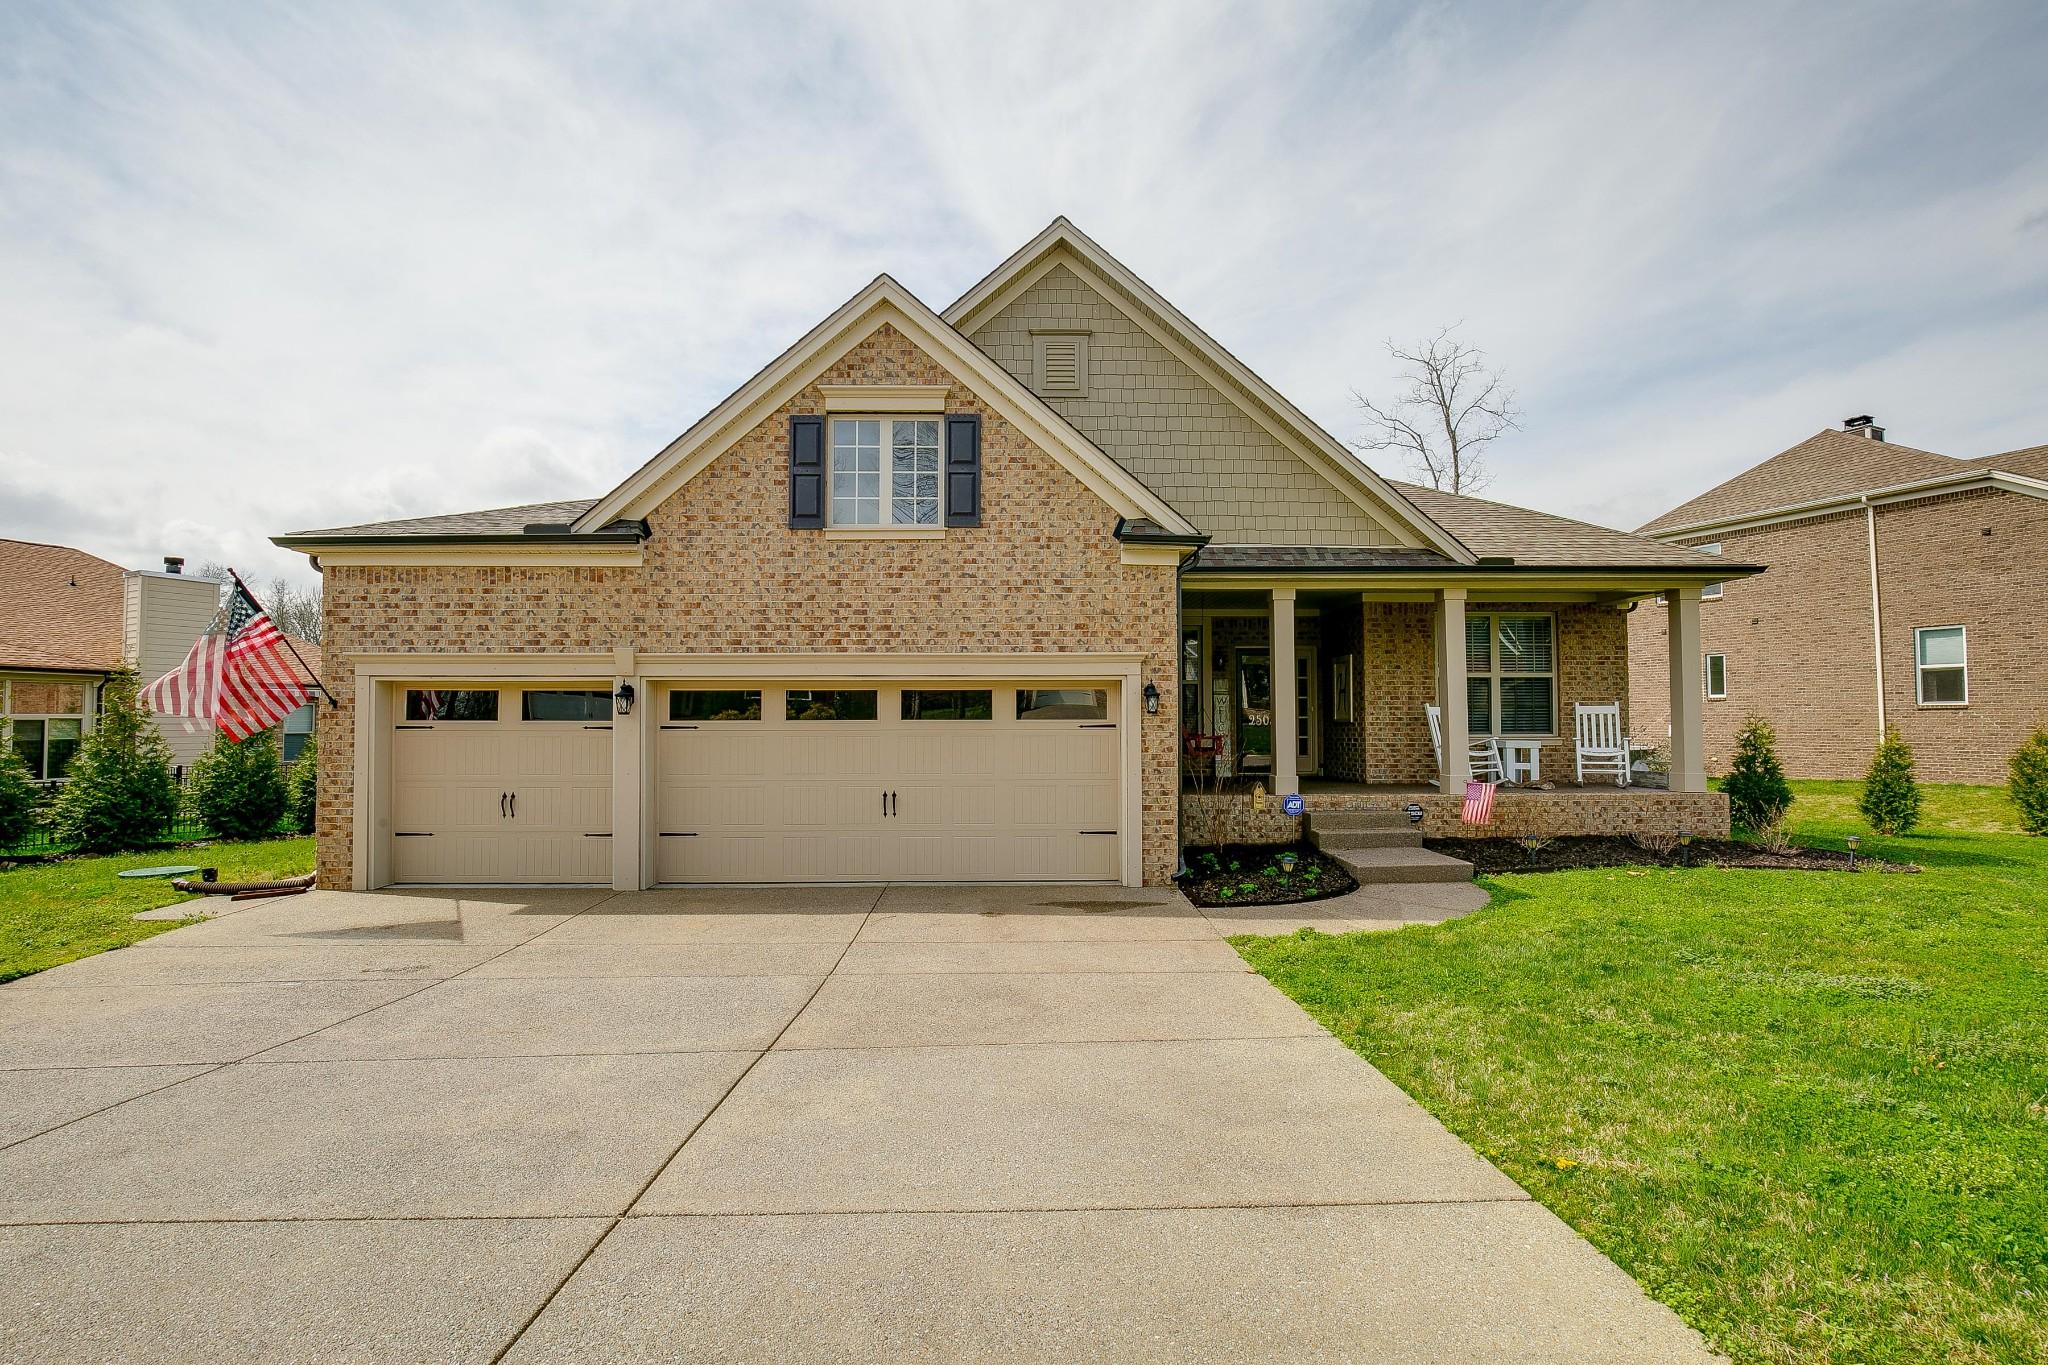 2505 Arbor Pointe Cv Property Photo - Hermitage, TN real estate listing